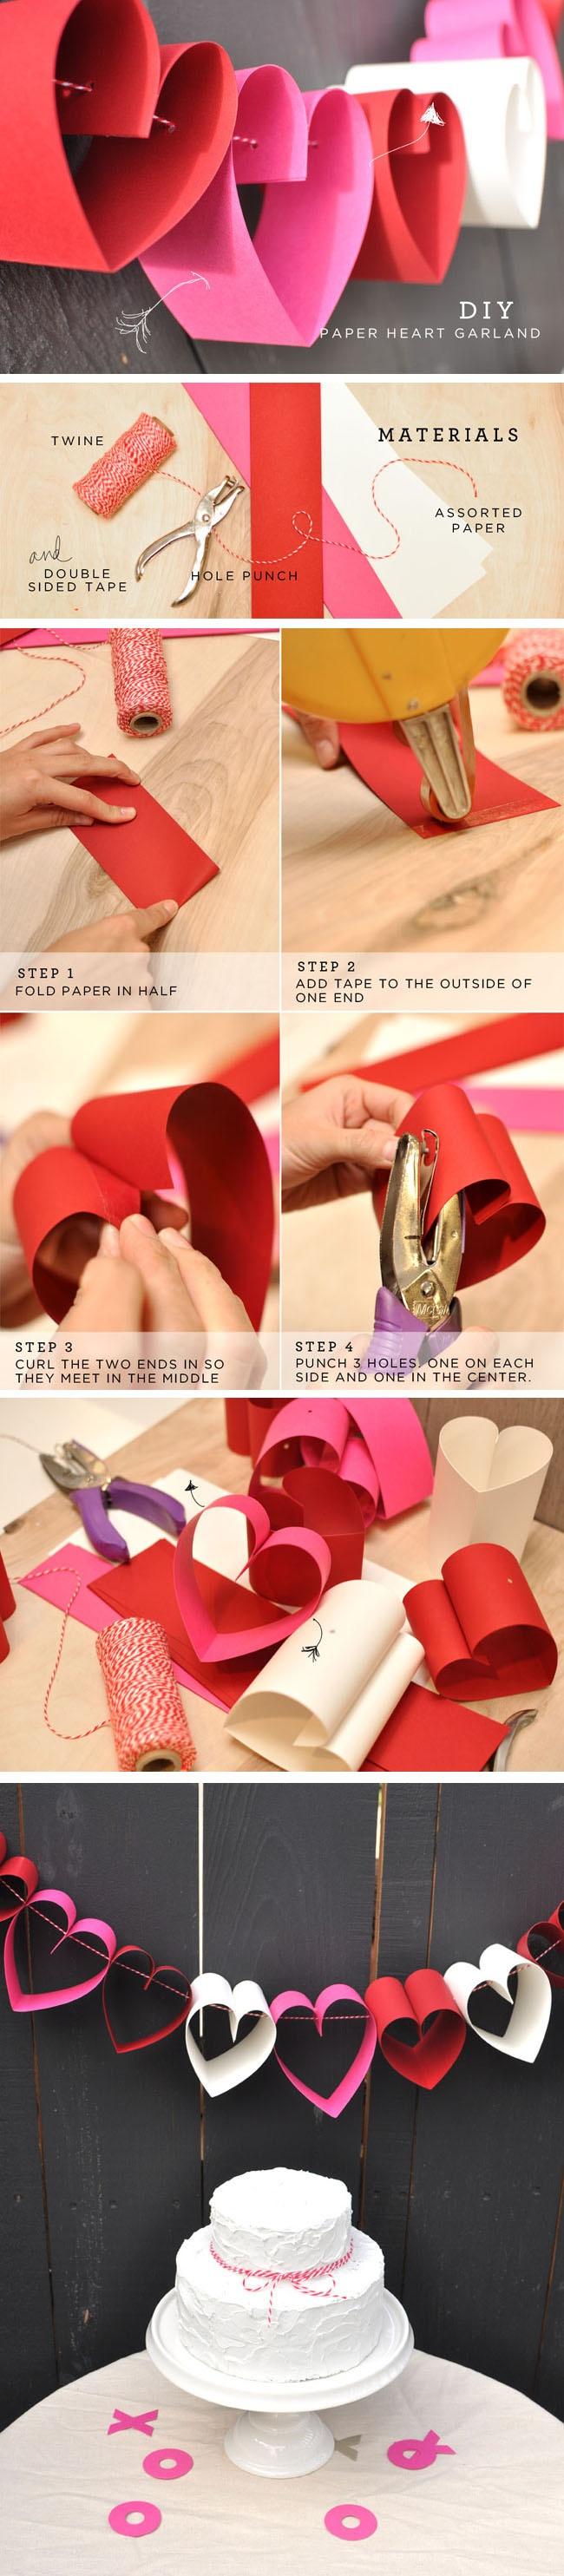 paper heart DIY